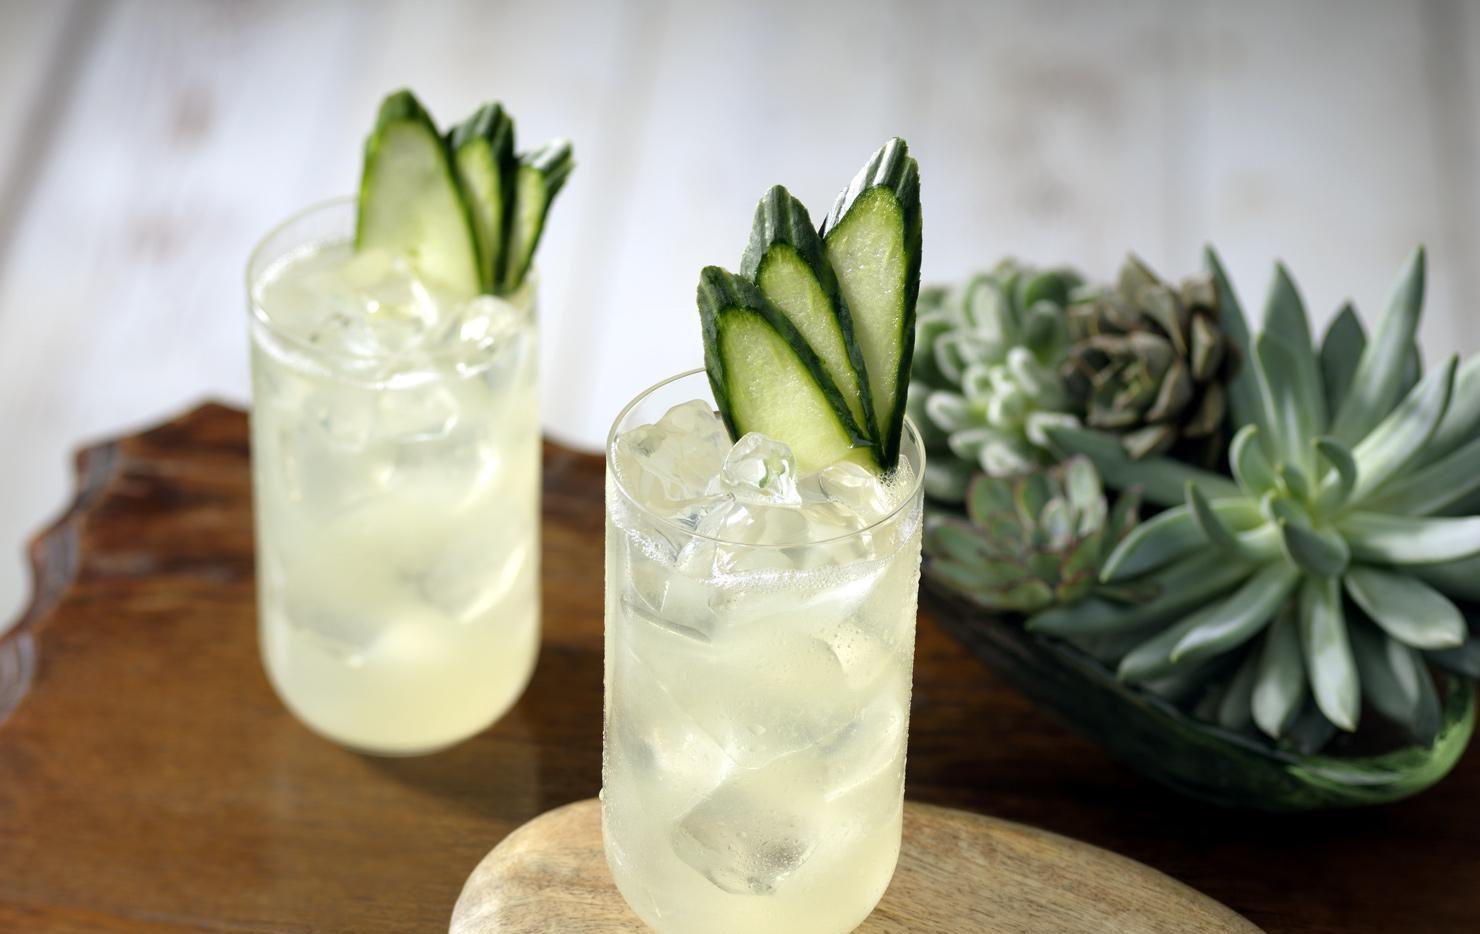 Margarita con sabor a pepino.(AGENCIA REFORMA)